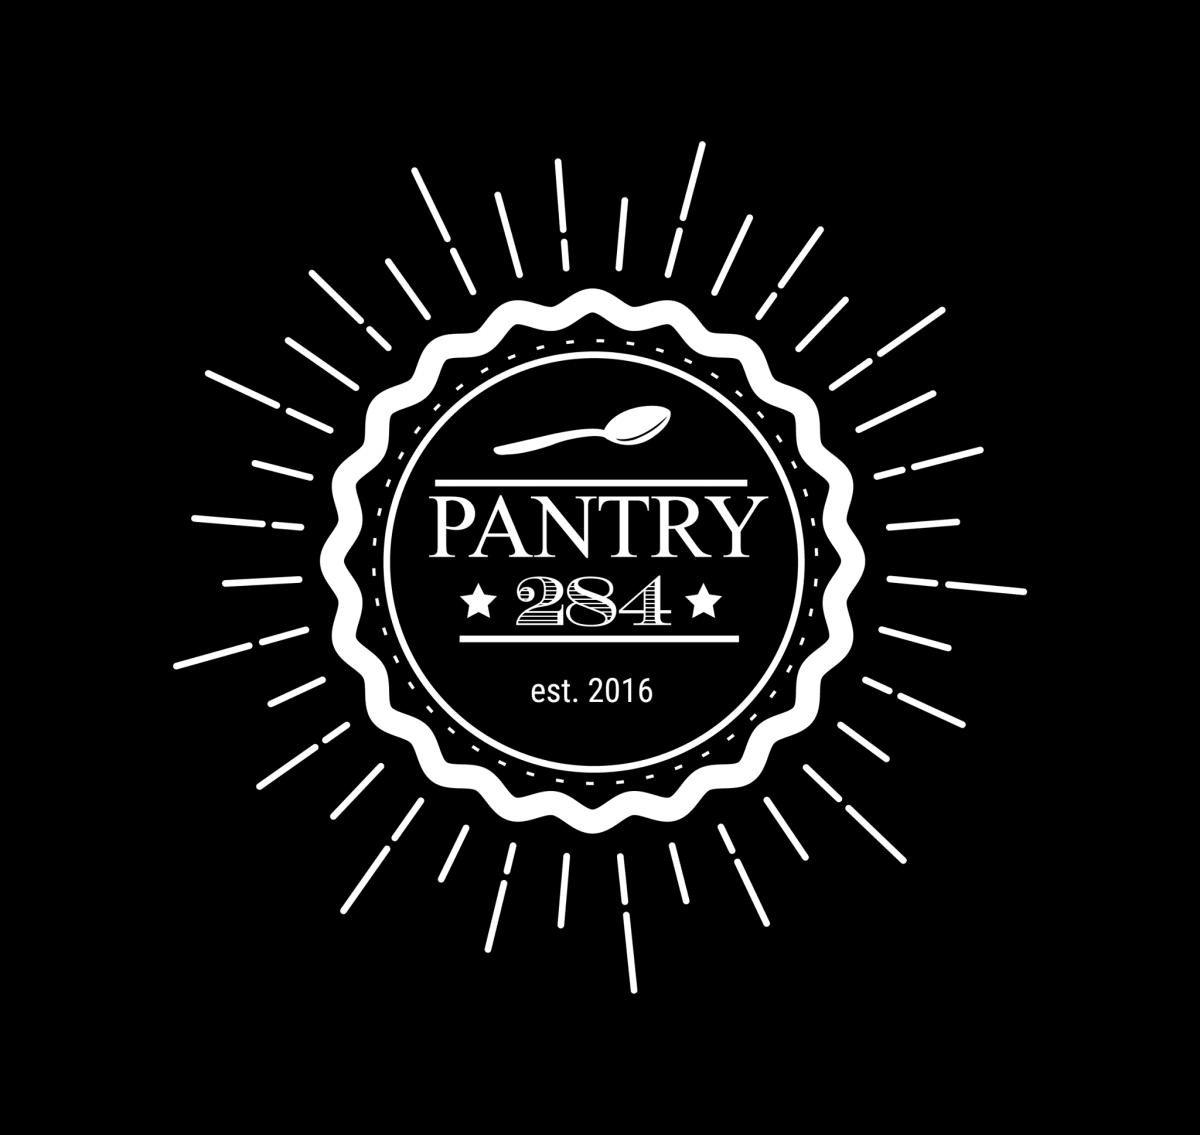 Pantry 284